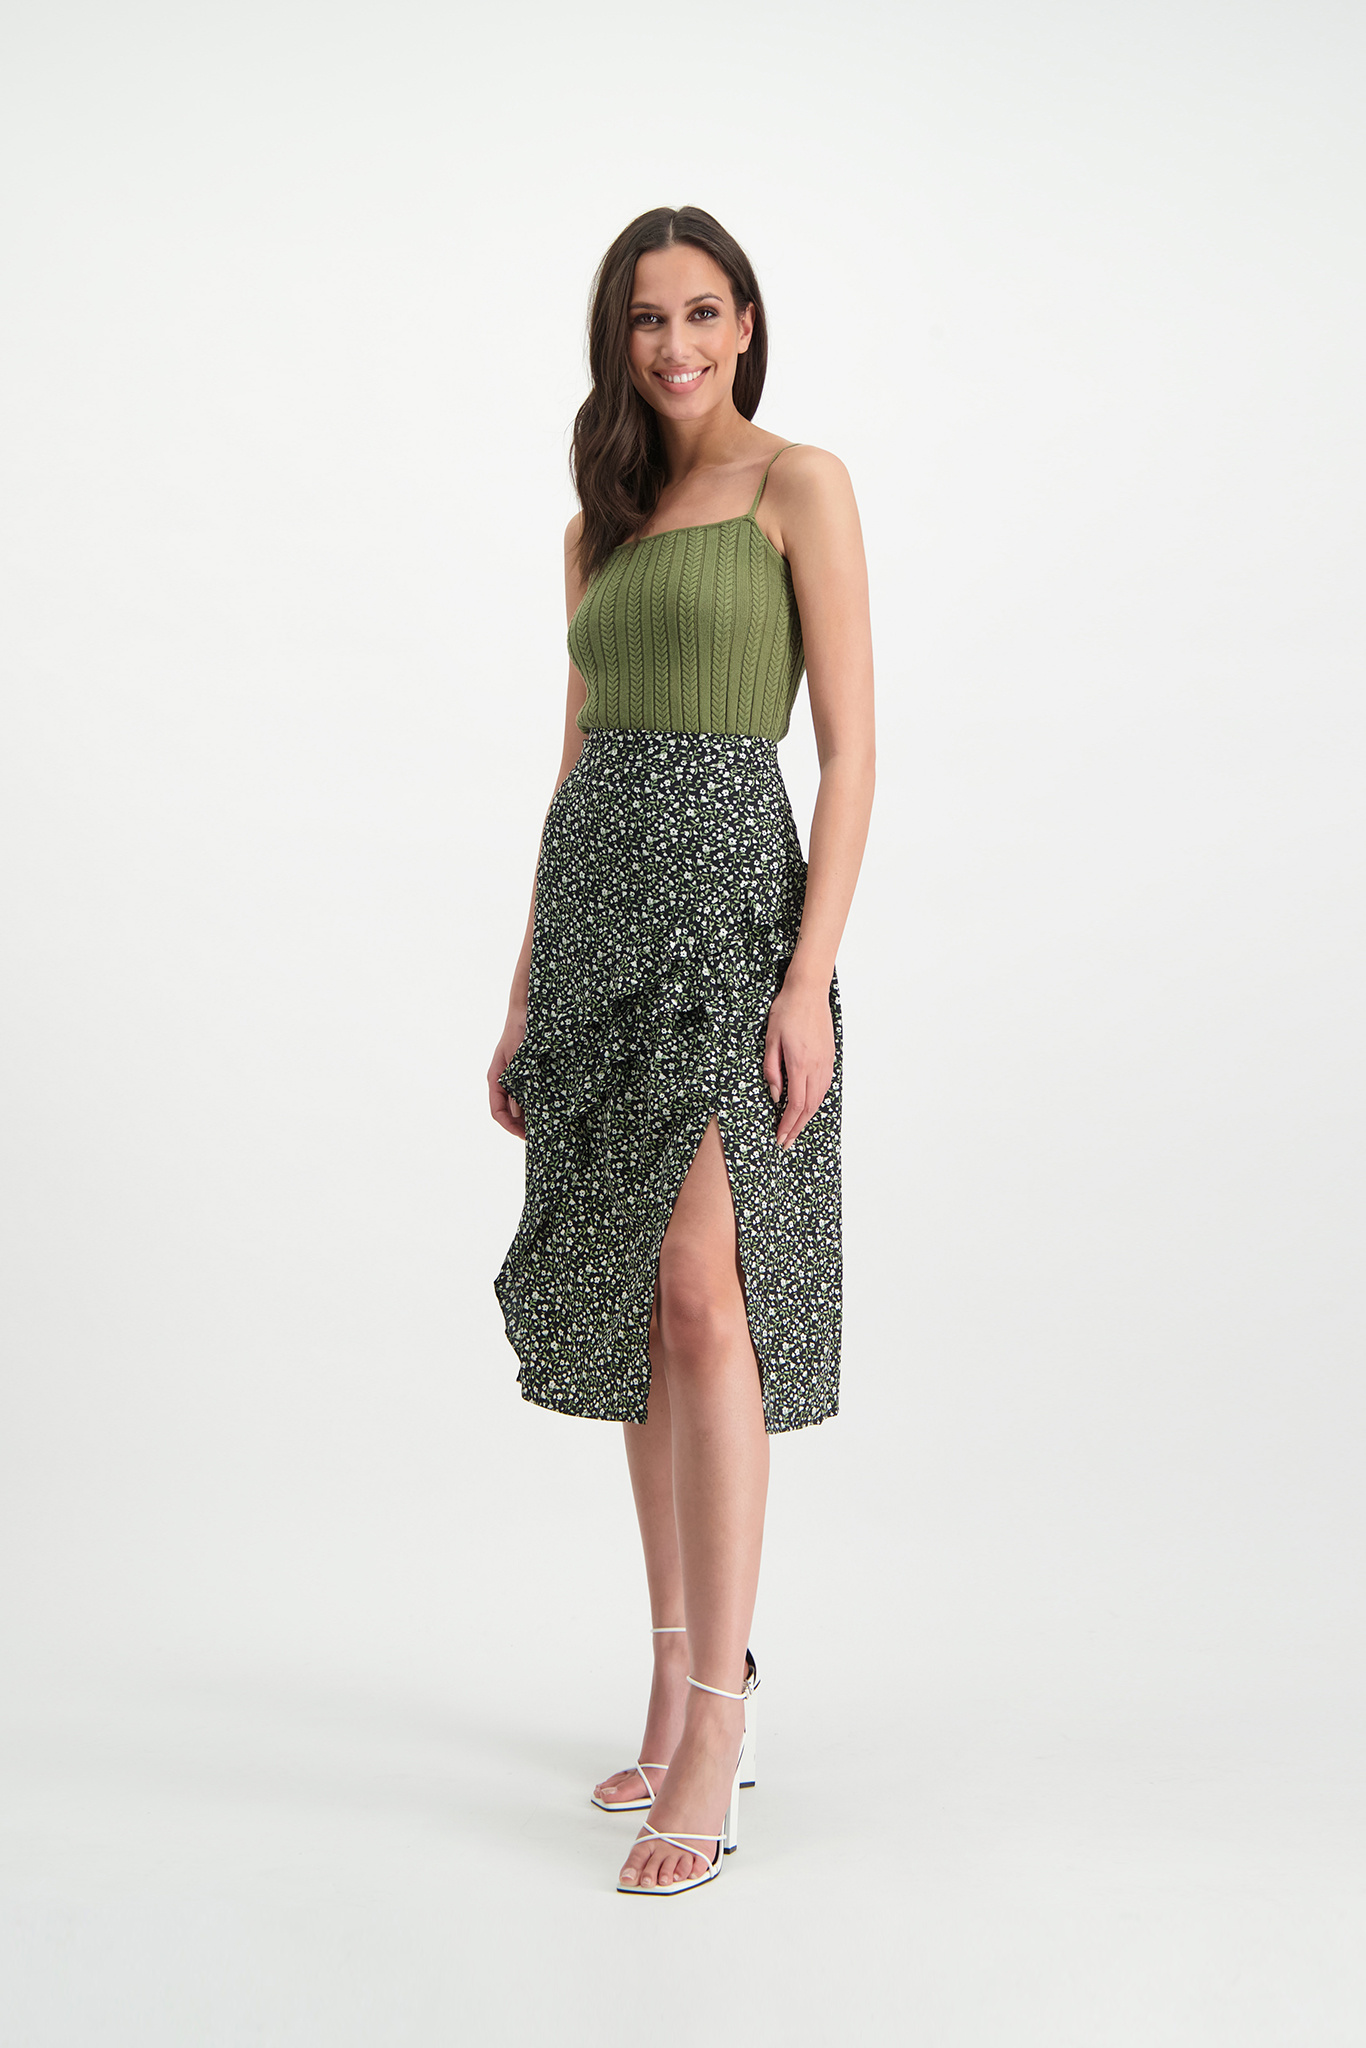 Lofty Manner Green Knitted Camisole Jolene